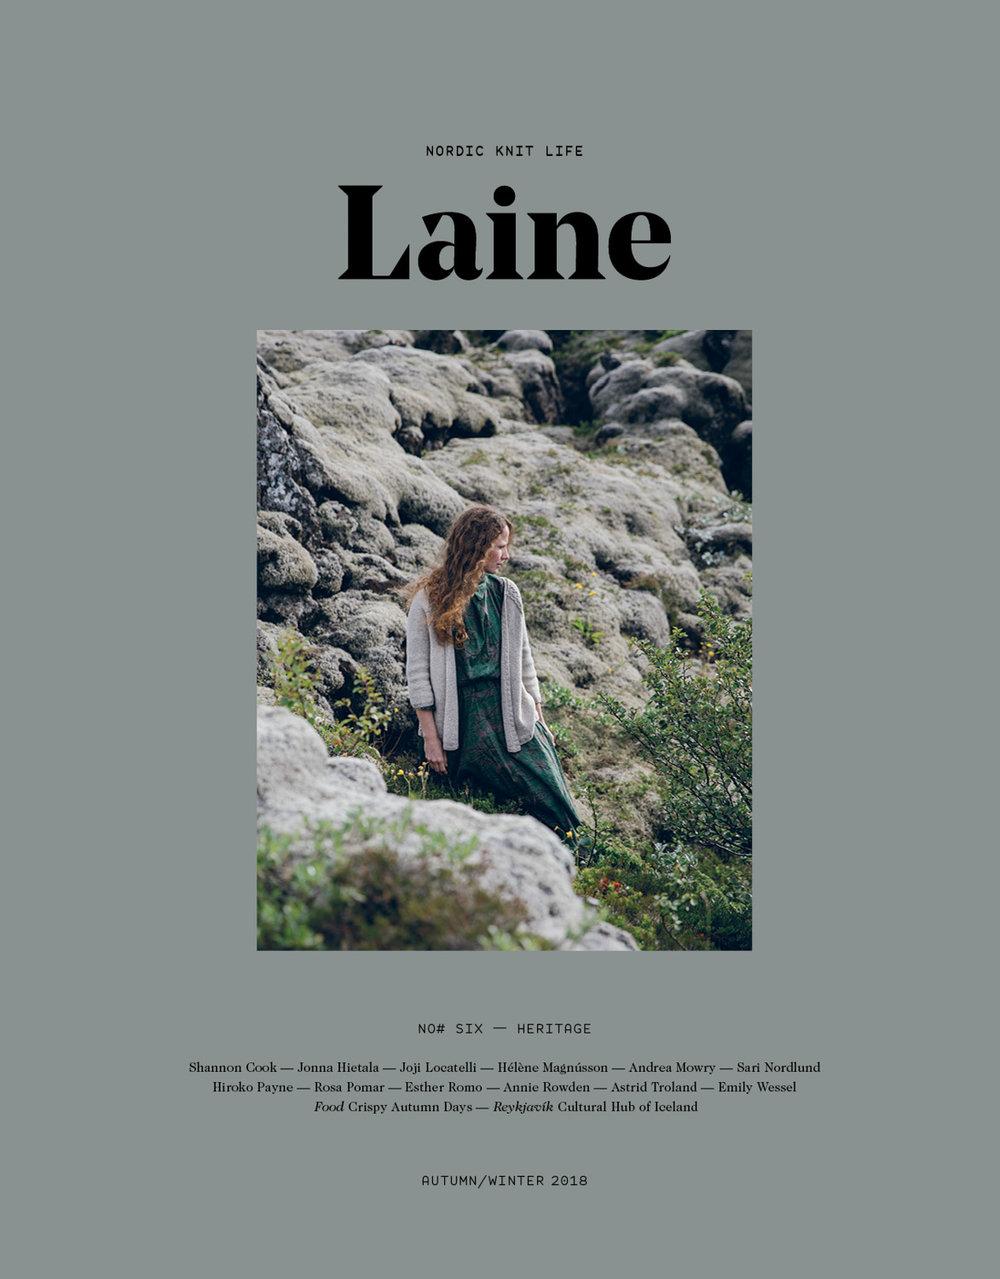 laine_6_Cover_001.jpg